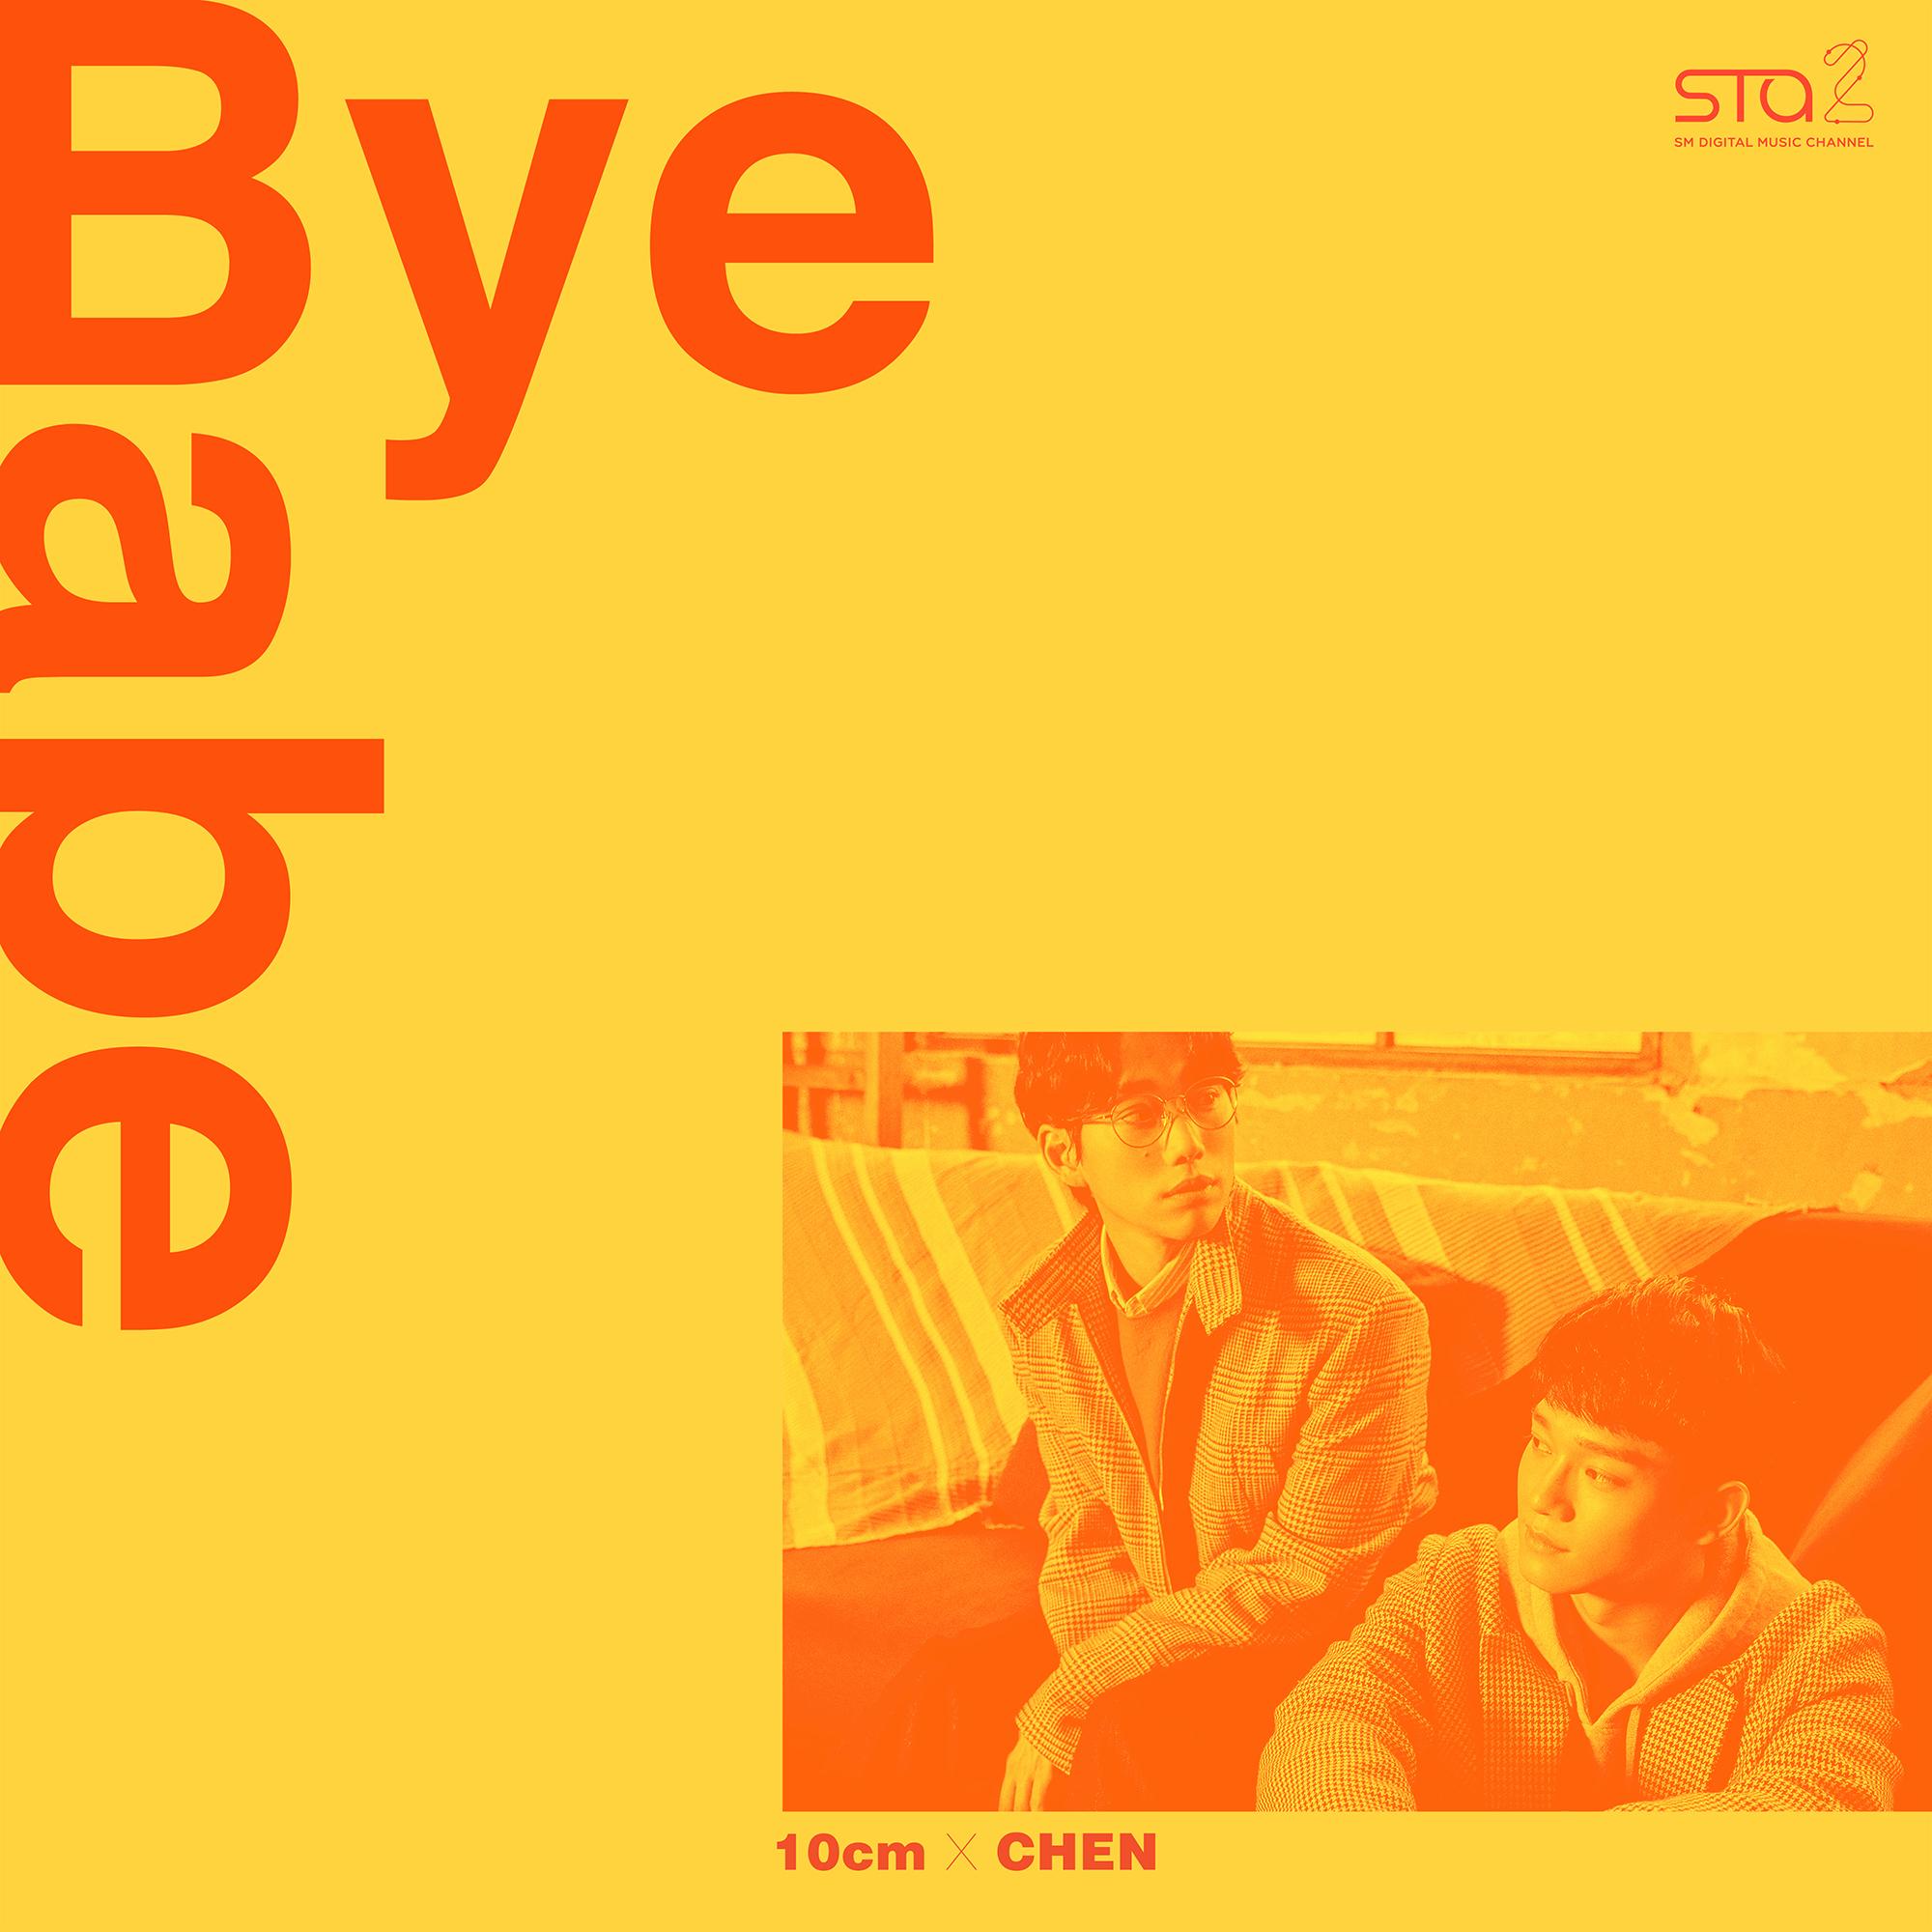 10cm X EXO成员CHEN《Bye Babe》今日下午5点公开